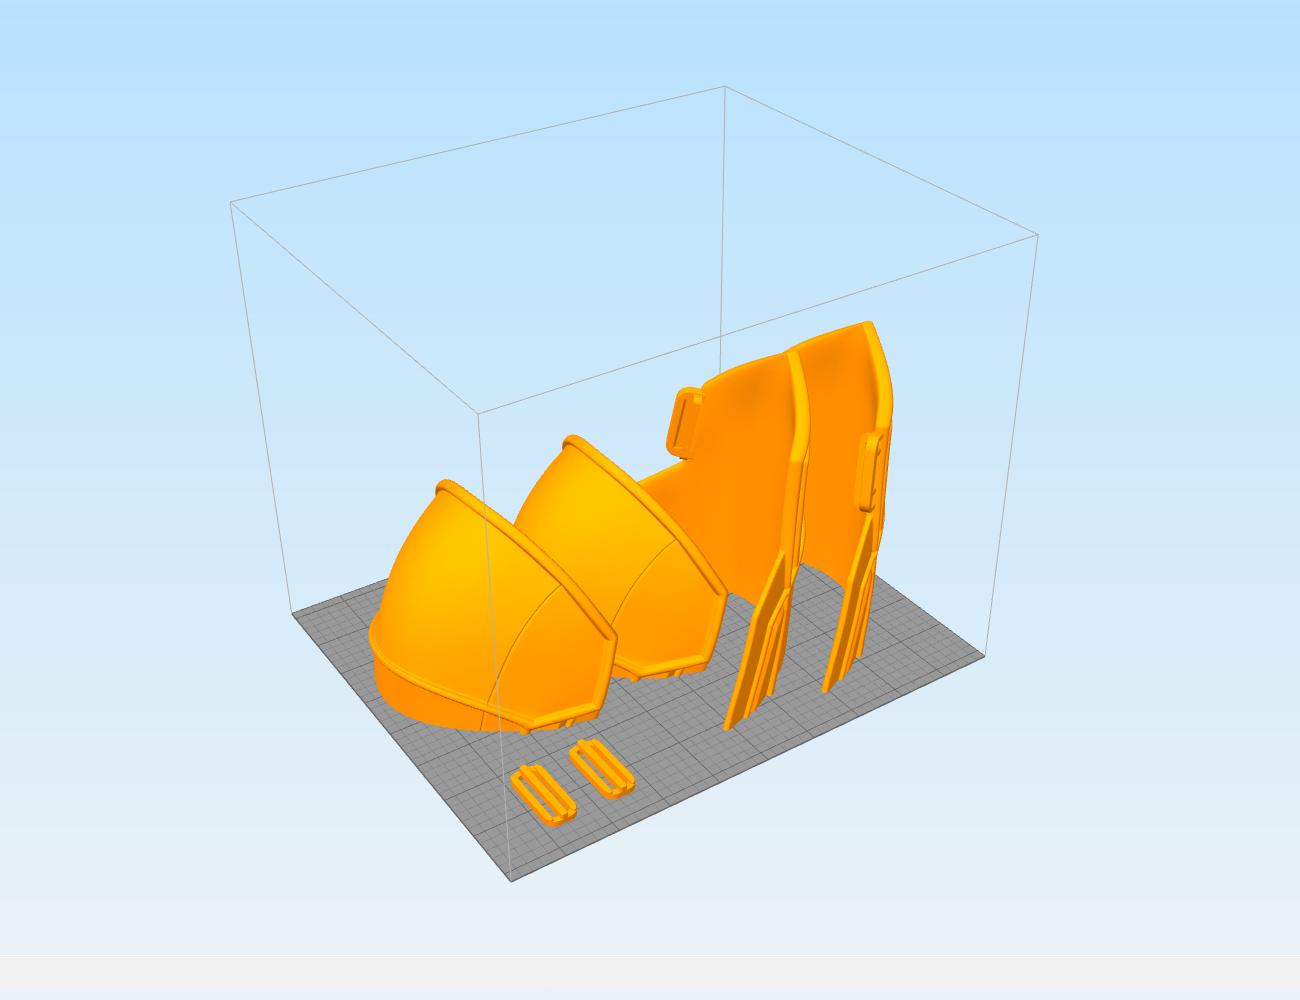 3D1BW.png Download STL file White shoulder armor – BLACK WIDOW 3D PRINT MODEL • 3D printable template, 3D-mon